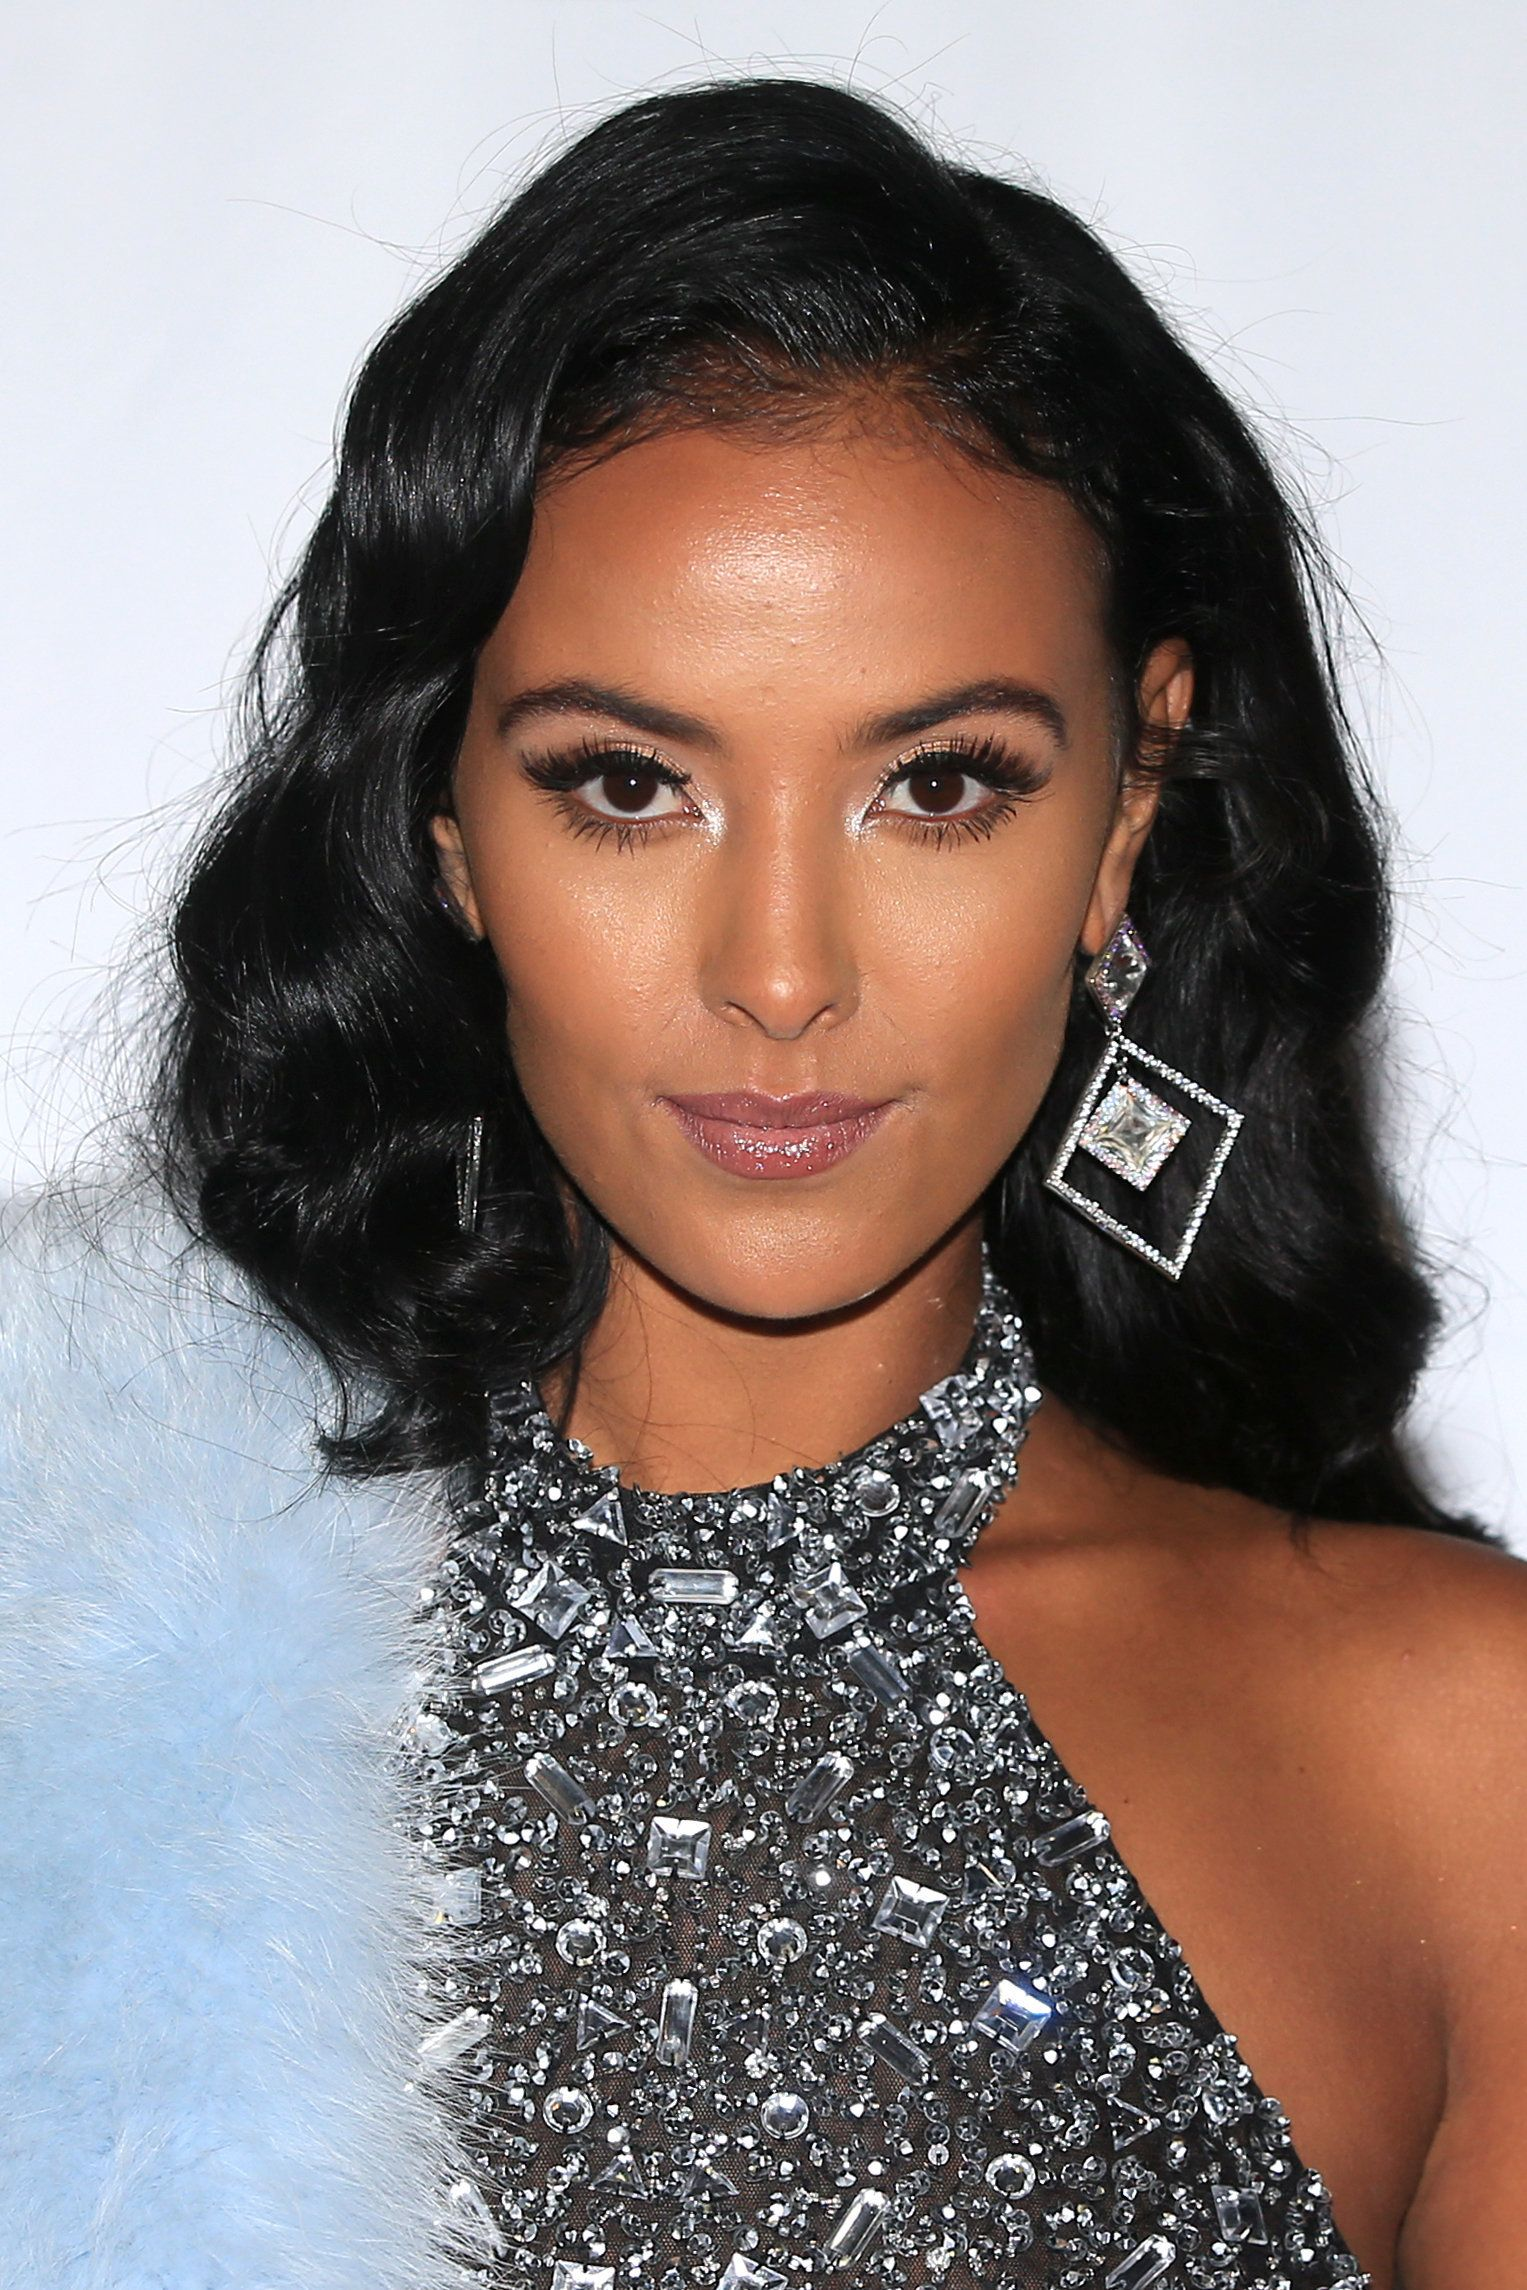 Get To Know Maya Jama, Radio 1's Latest Recruit